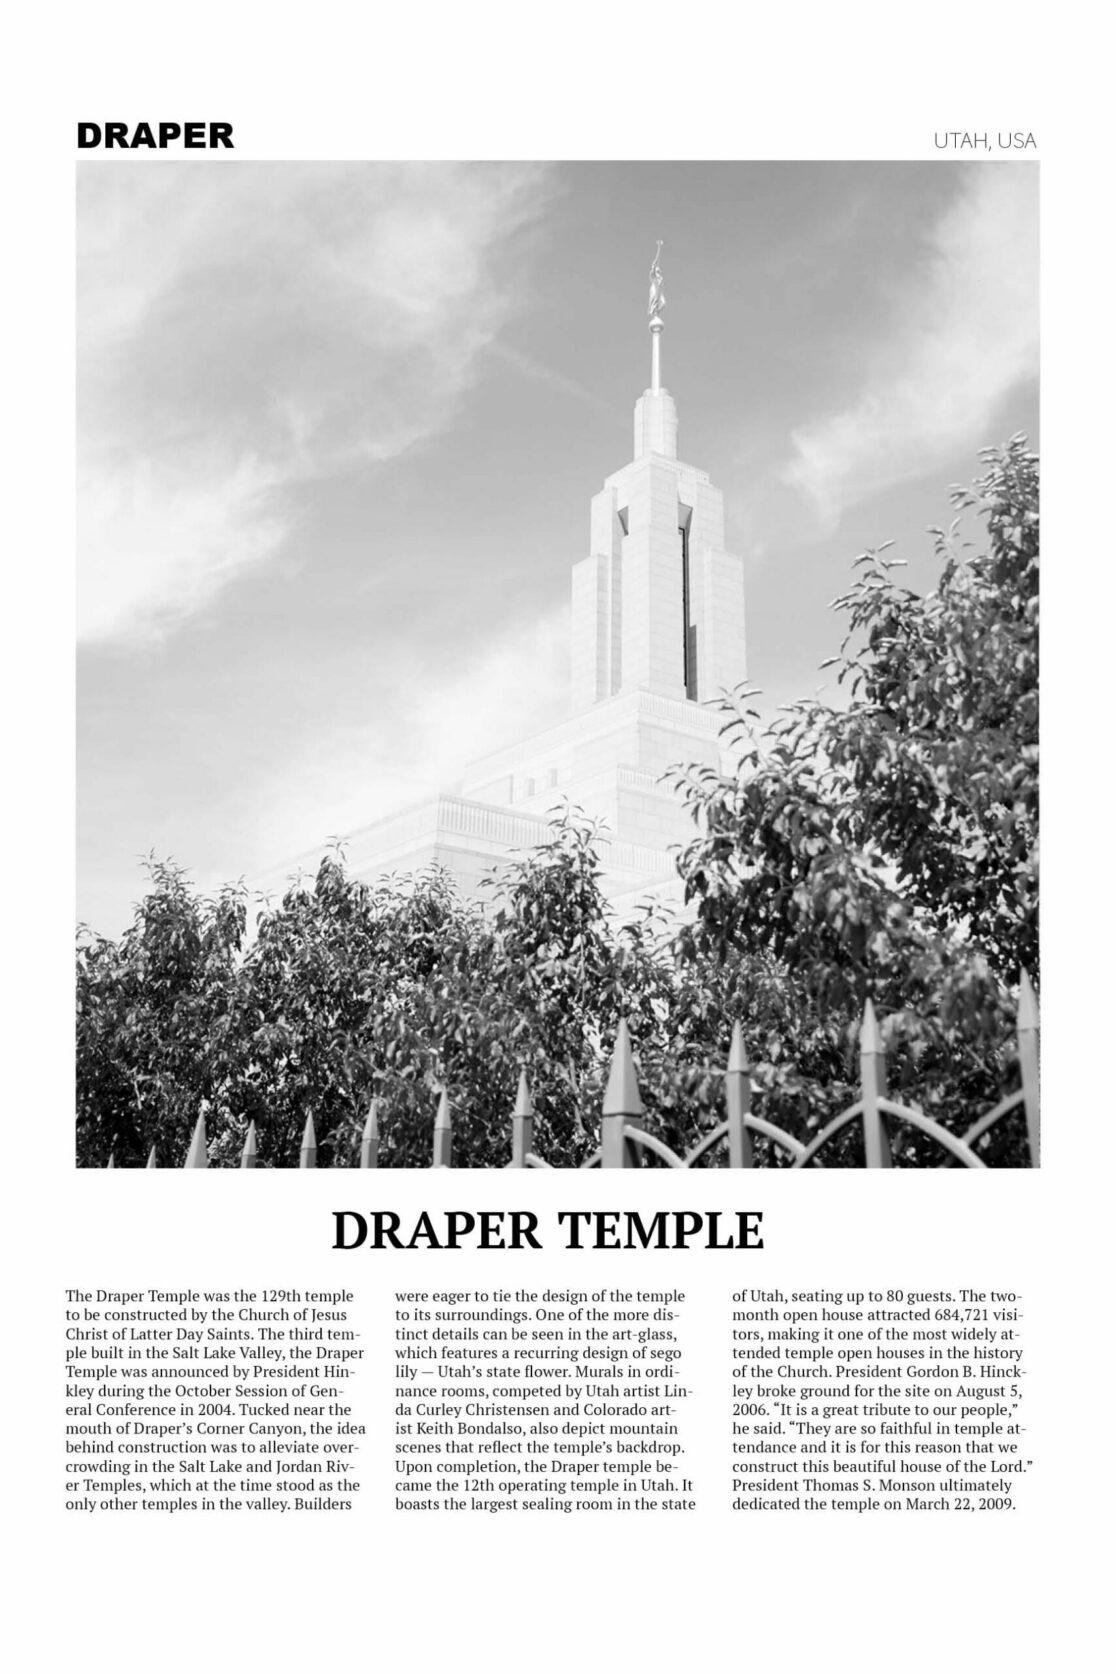 Up close Draper Temple Photo Poster